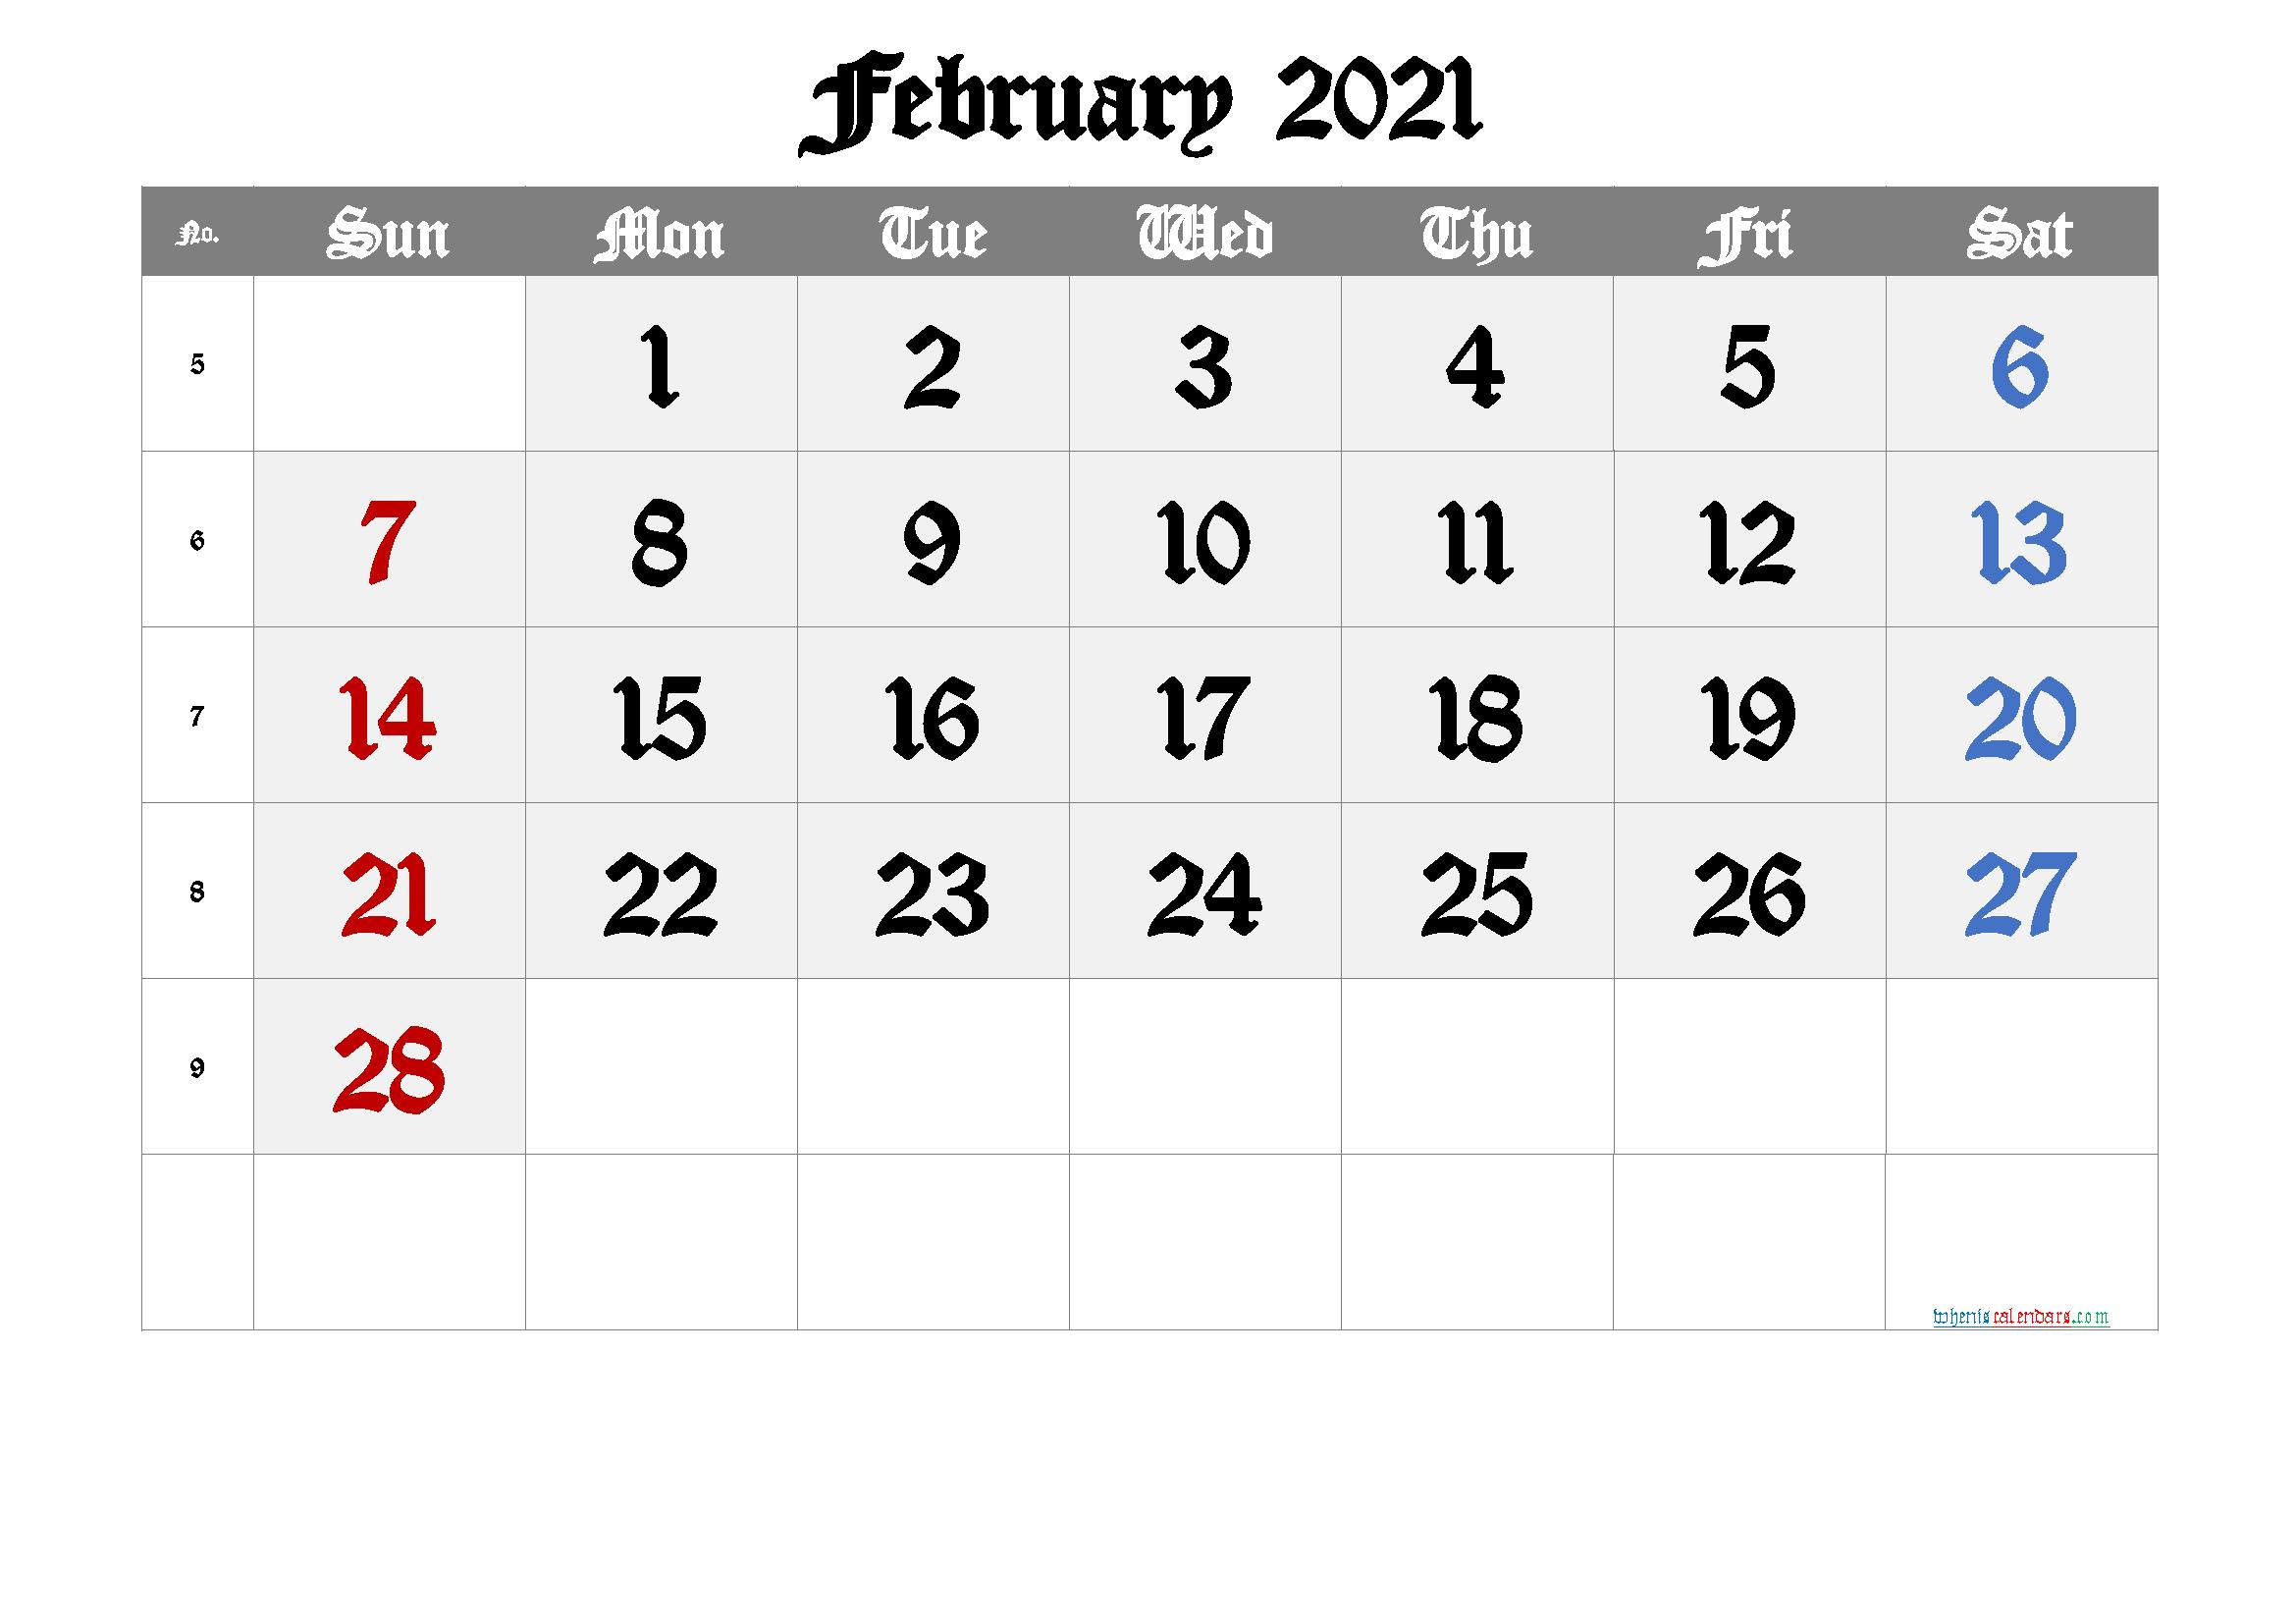 Free February 2021 Calendar Free Premium In 2020 Calendar Printables Calendar With Week Numbers Printable Calendar